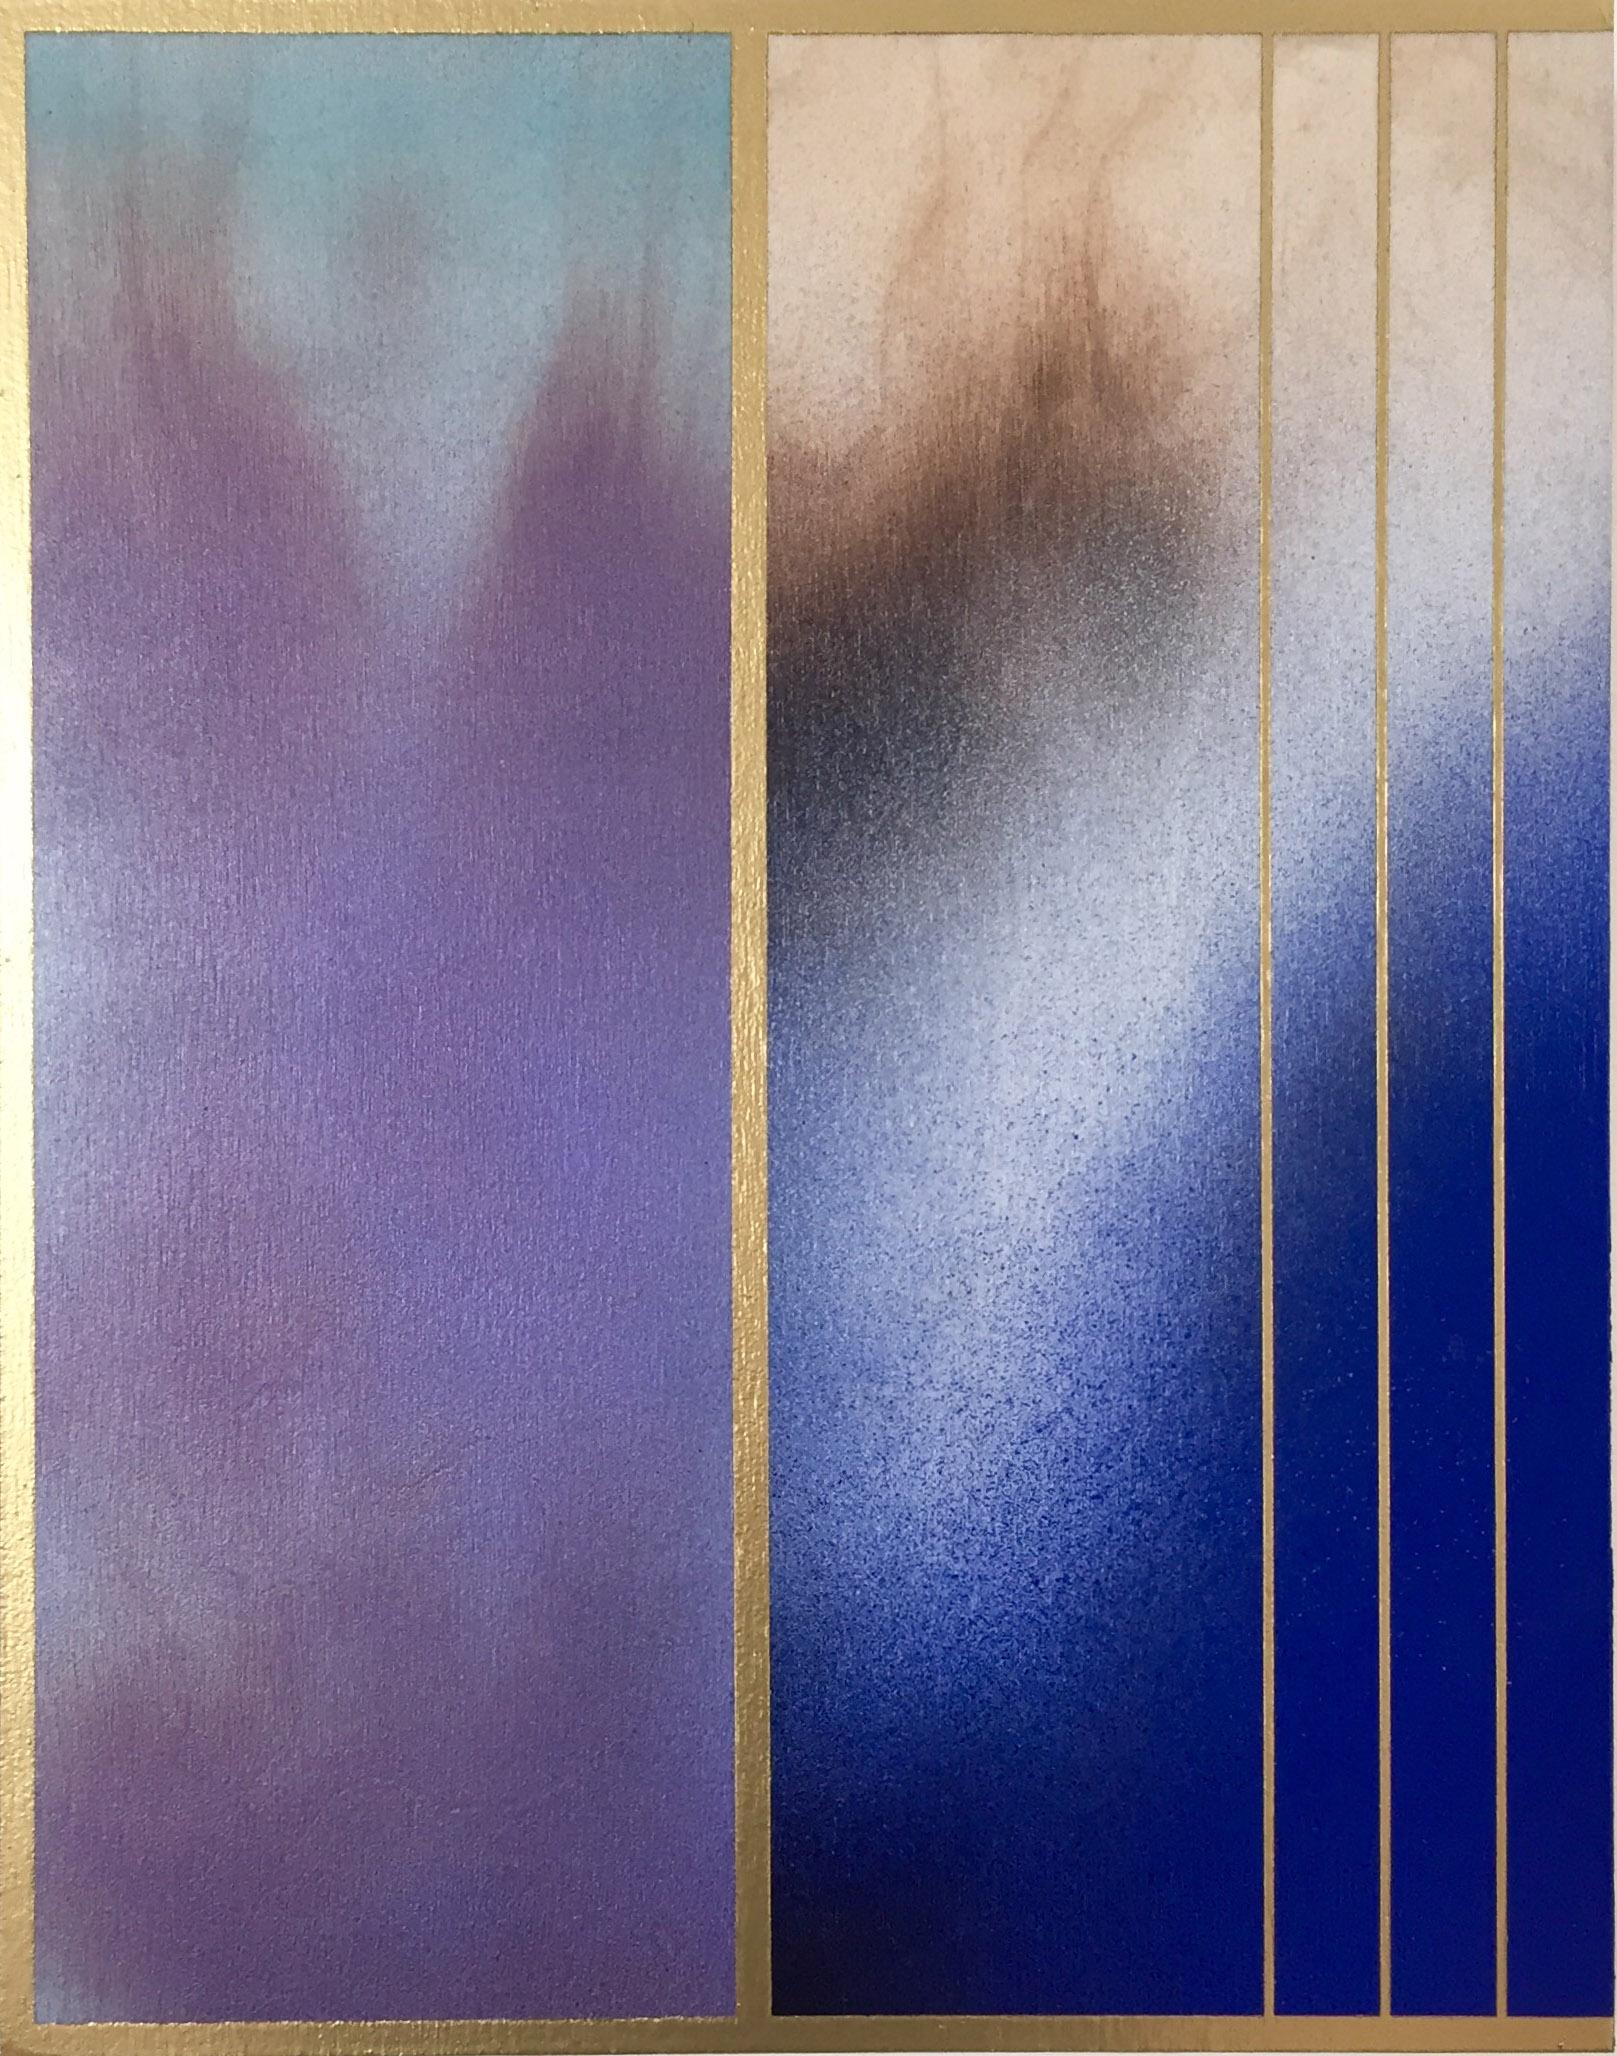 MELISA TAYLOR-METZGER, FROST AND DECIMALS IX, 14 x 11 inches | $400